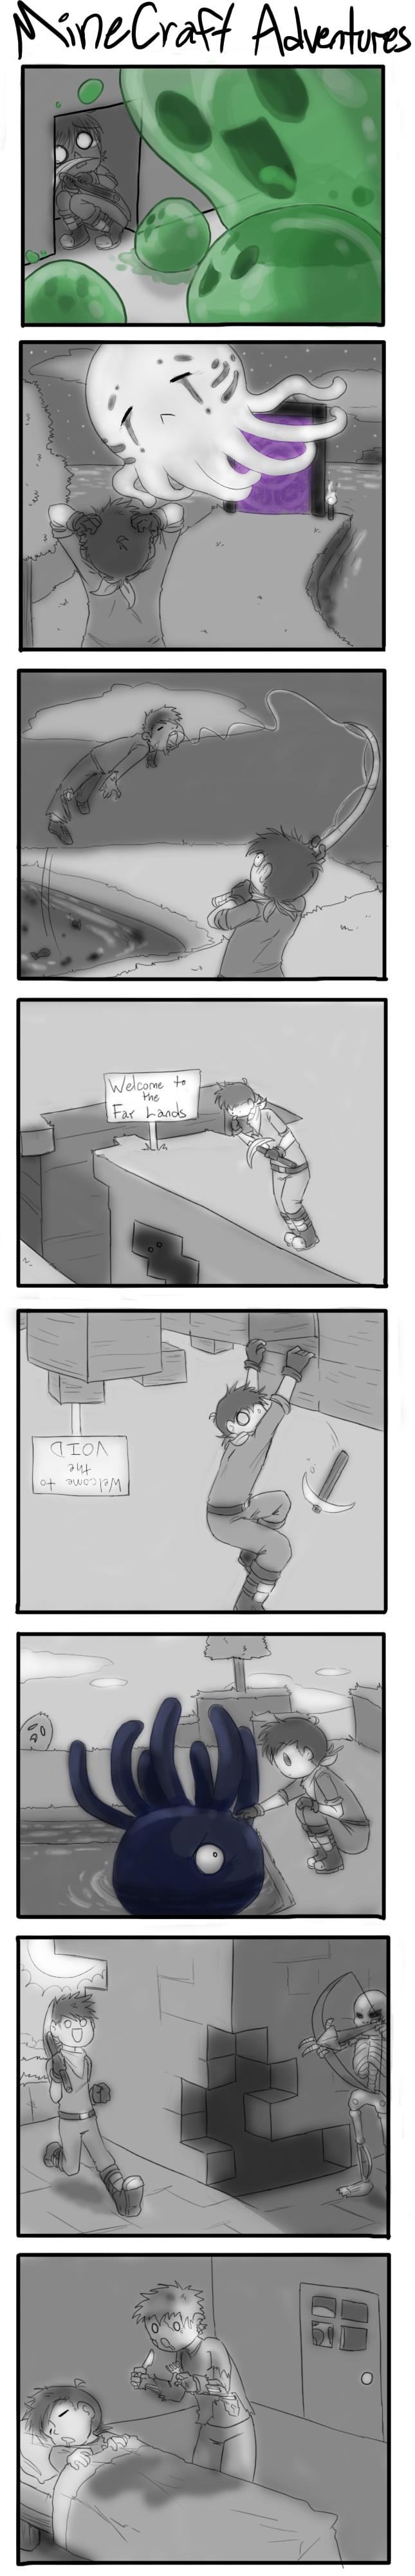 http://img.niceminecraft.net/Funny/Minecraft-Comic-37.jpg